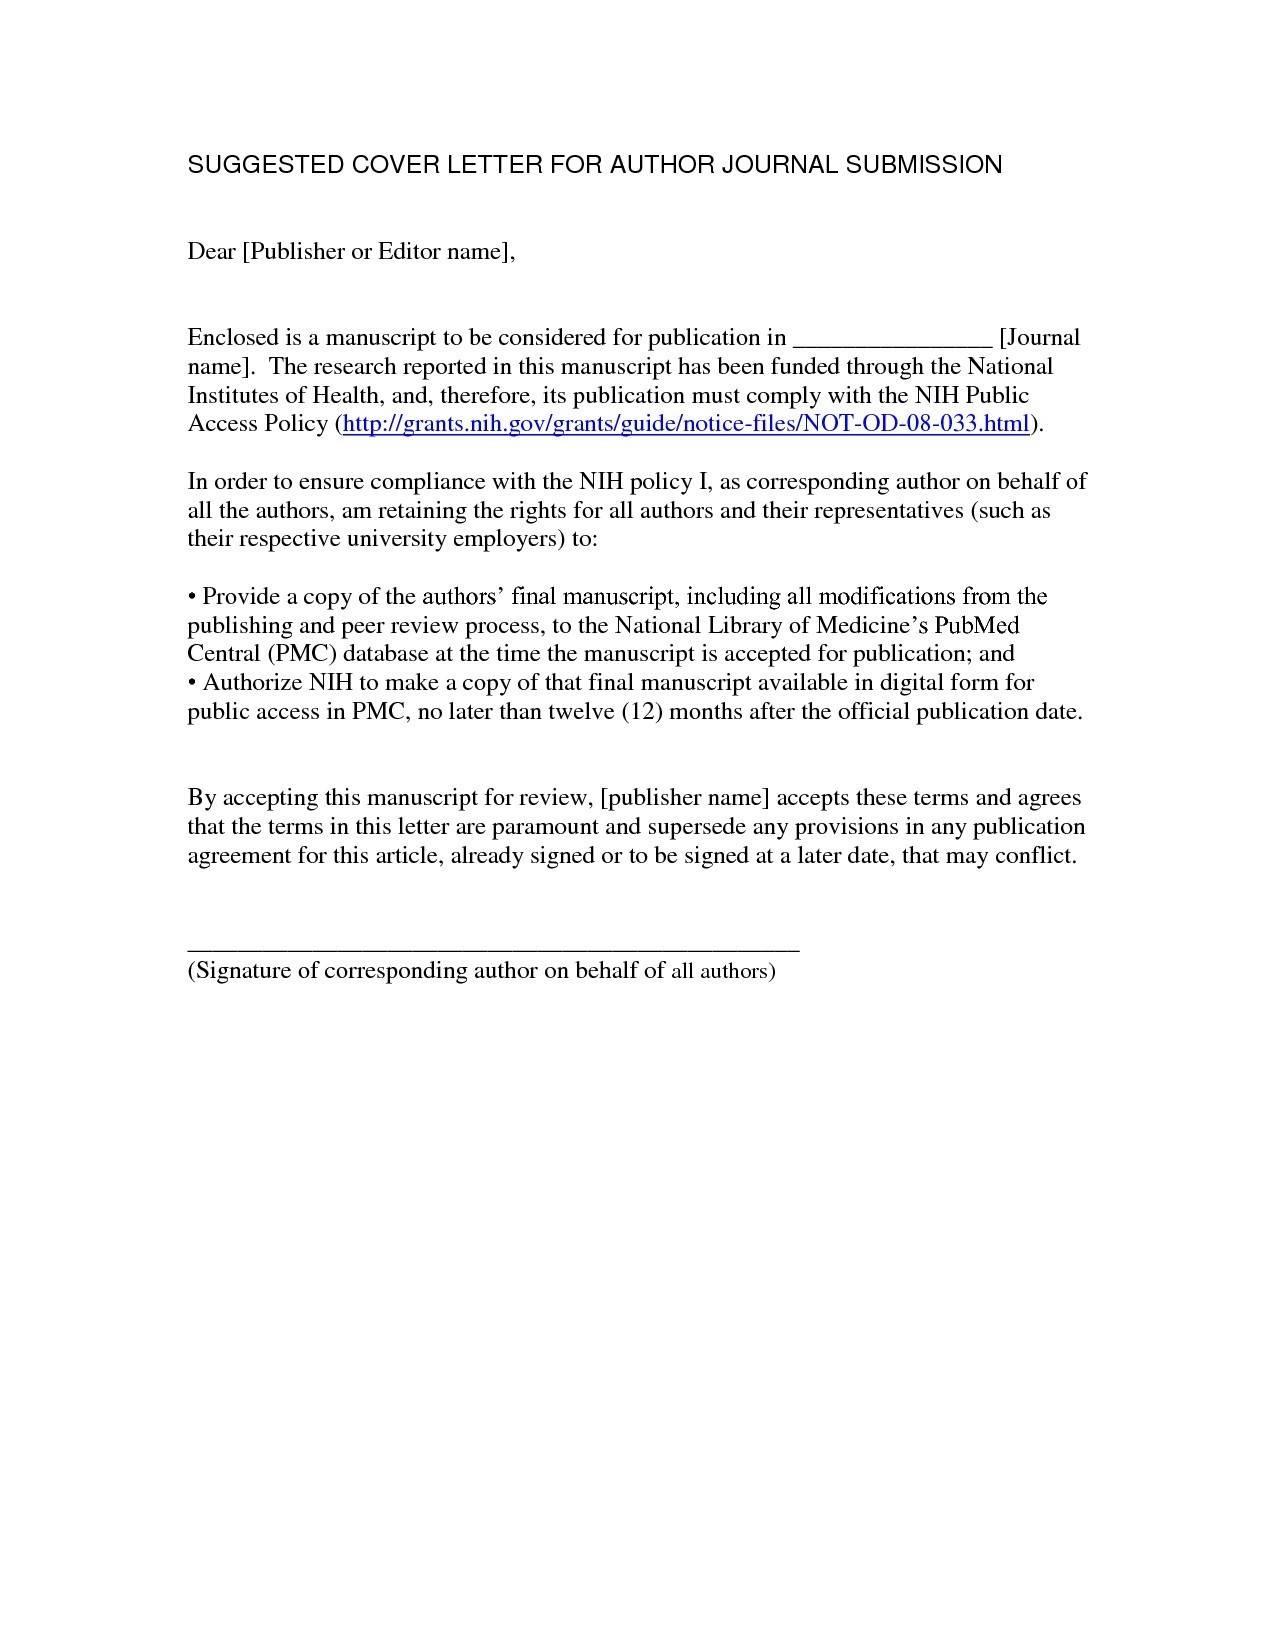 Rent Payment Agreement Letter Sample Templates Mtm3mzu0